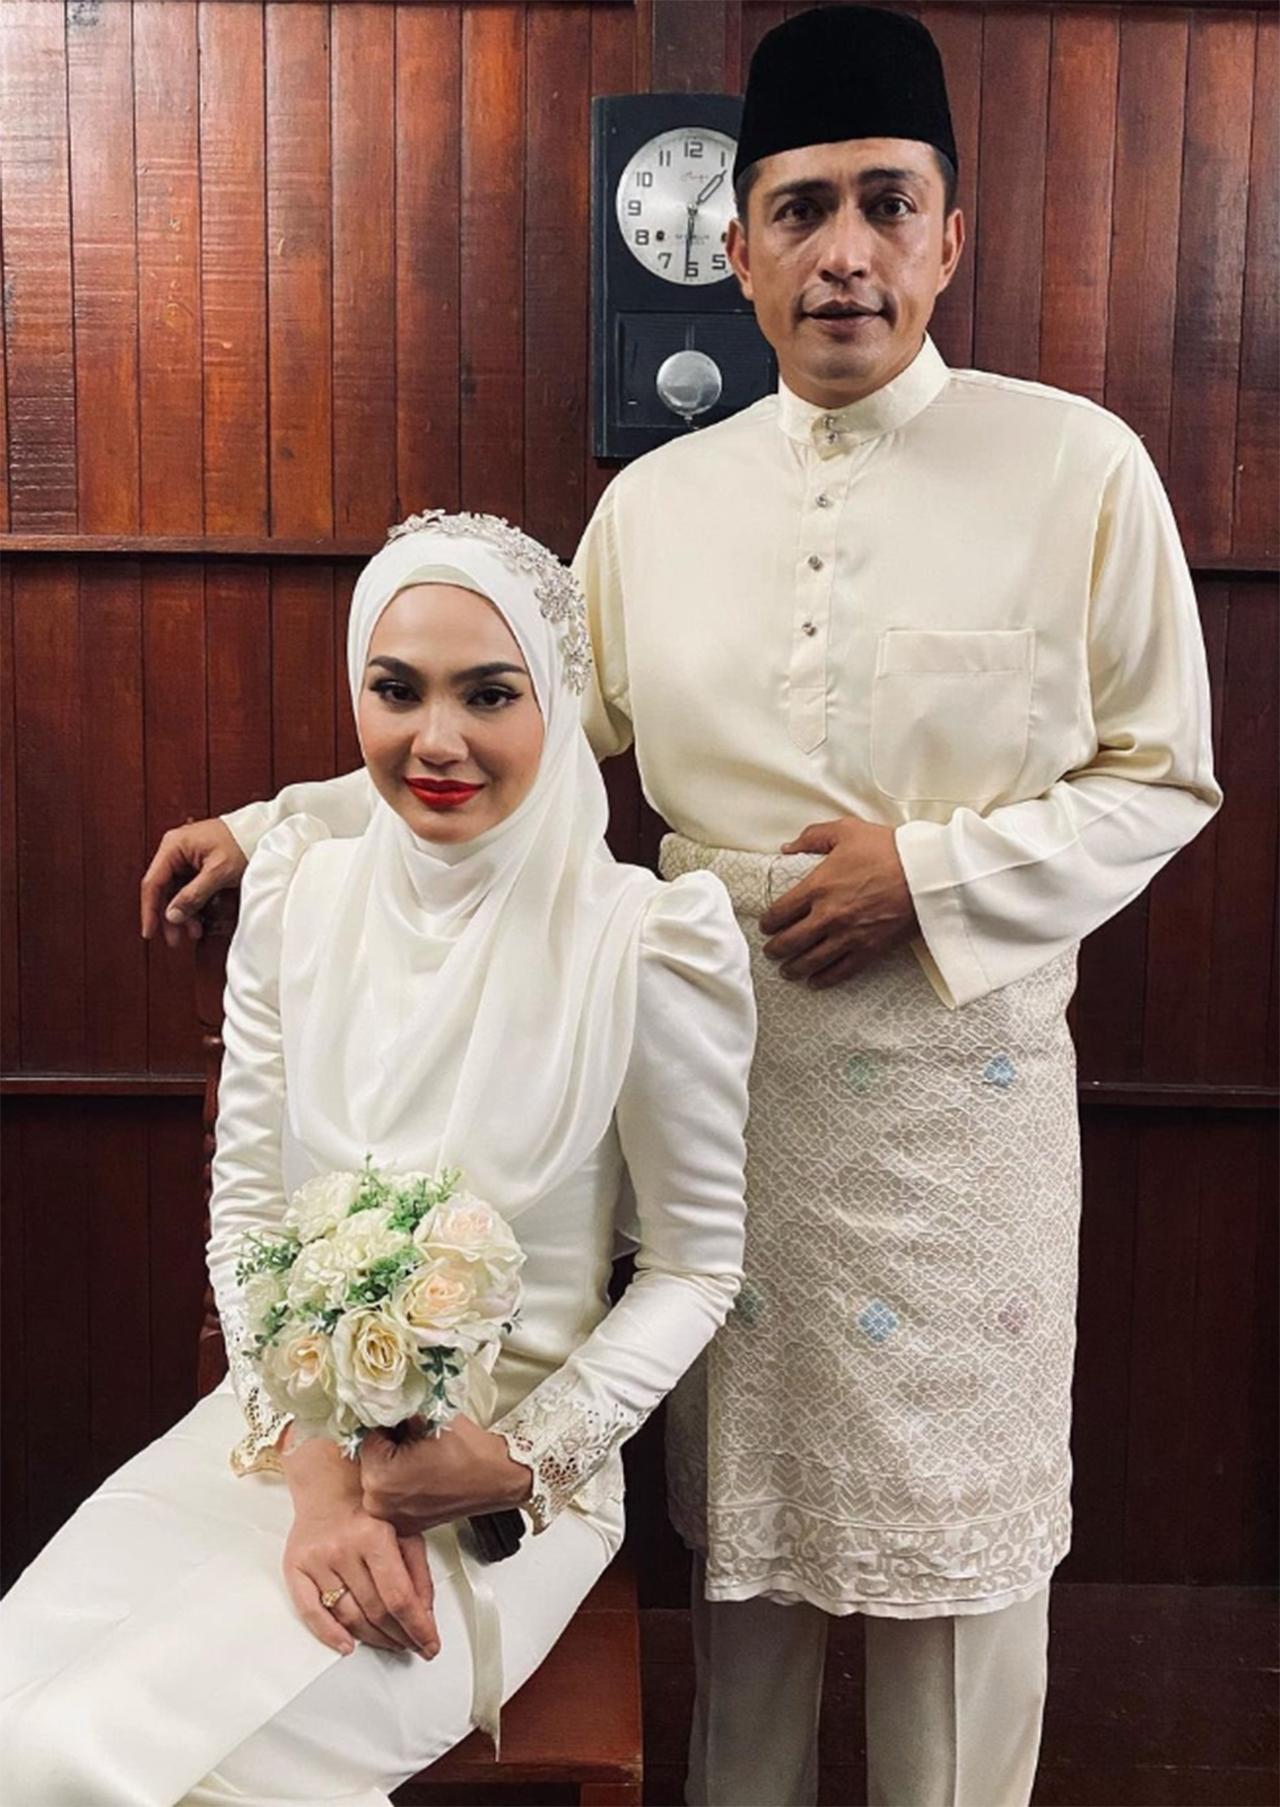 Drama Aku Yang Kau Gelar Isteri Episod 1-15(Akhir) Lakonan Dato' Adi Putra dan Nadia Bria